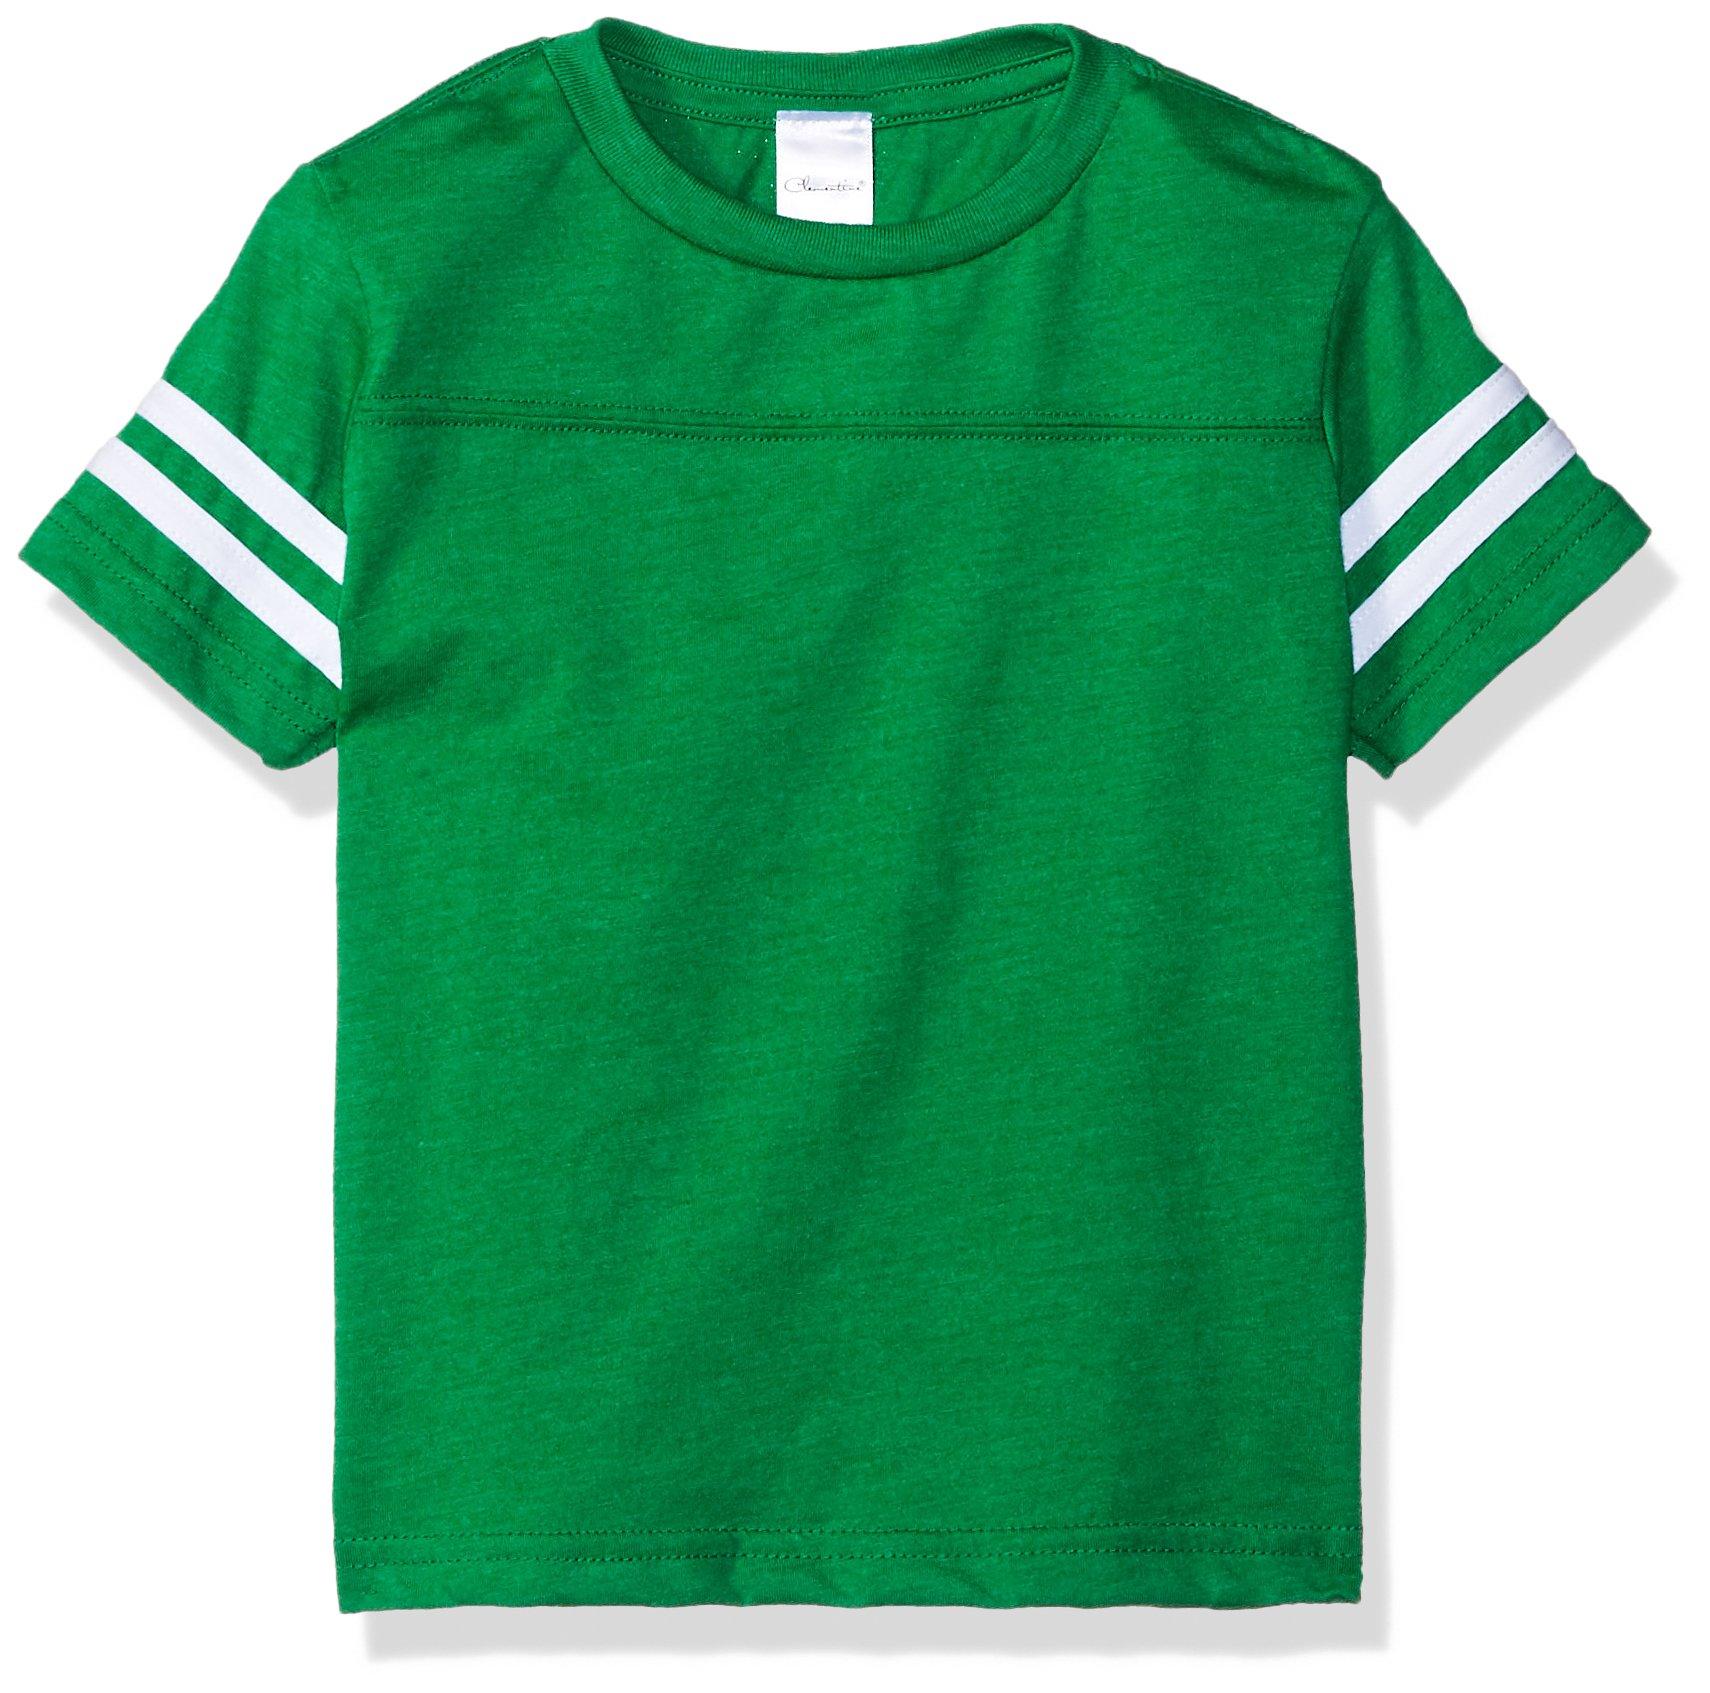 Clementine Toddler Kids Football Fine Jersey T-Shirt, GRN HTH/Vin SMK, 3T